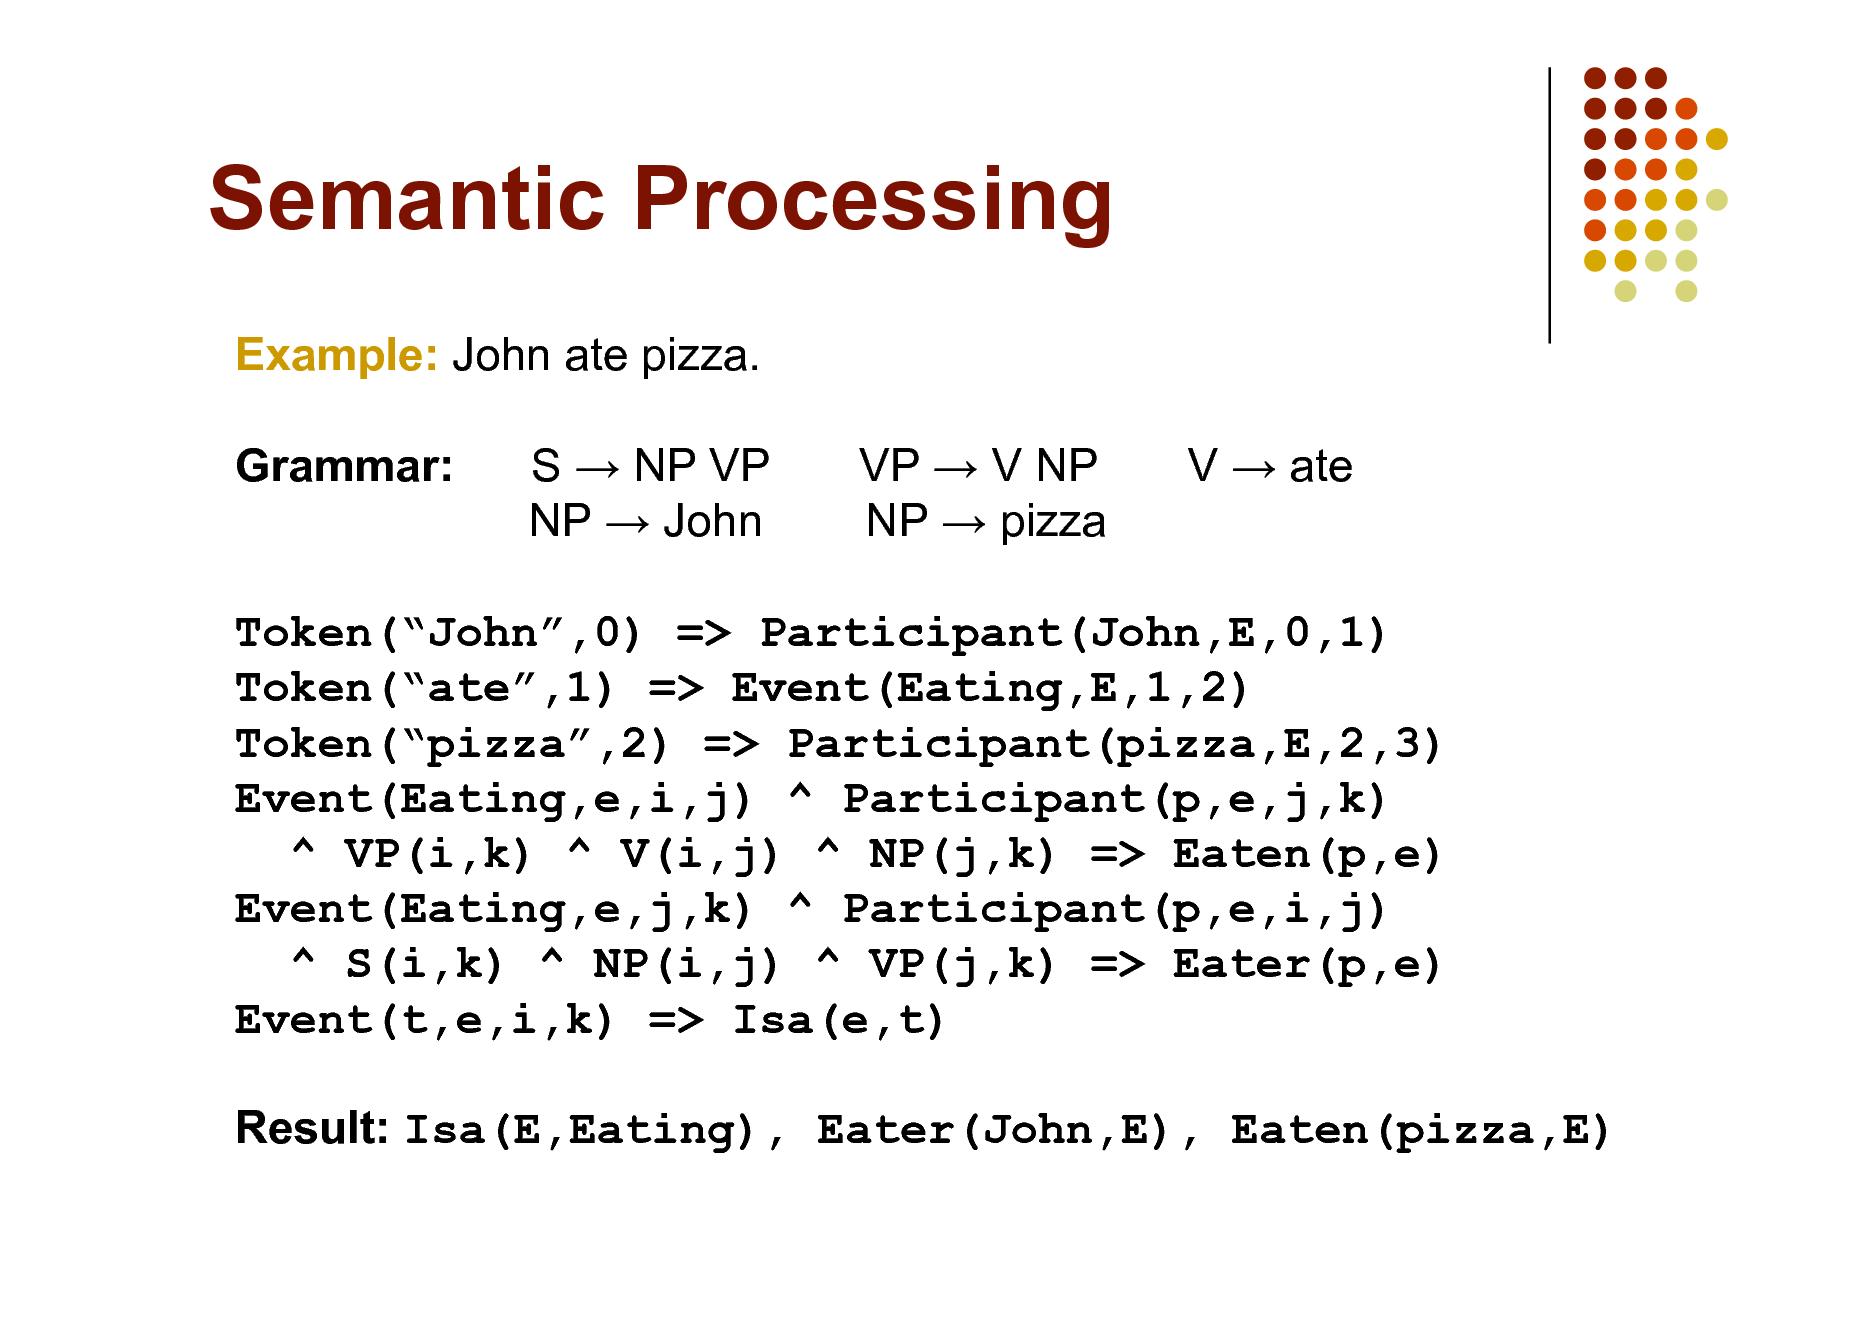 Slide: Semantic Processing Example: John ate pizza. Grammar: S  NP VP NP  John VP  V NP NP  pizza V  ate  Token(John,0) => Participant(John,E,0,1) Token(ate,1) => Event(Eating,E,1,2) Token(pizza,2) => Participant(pizza,E,2,3) Event(Eating,e,i,j) ^ Participant(p,e,j,k) ^ VP(i,k) ^ V(i,j) ^ NP(j,k) => Eaten(p,e) Event(Eating,e,j,k) ^ Participant(p,e,i,j) ^ S(i,k) ^ NP(i,j) ^ VP(j,k) => Eater(p,e) Event(t,e,i,k) => Isa(e,t) Result: Isa(E,Eating), Eater(John,E), Eaten(pizza,E)